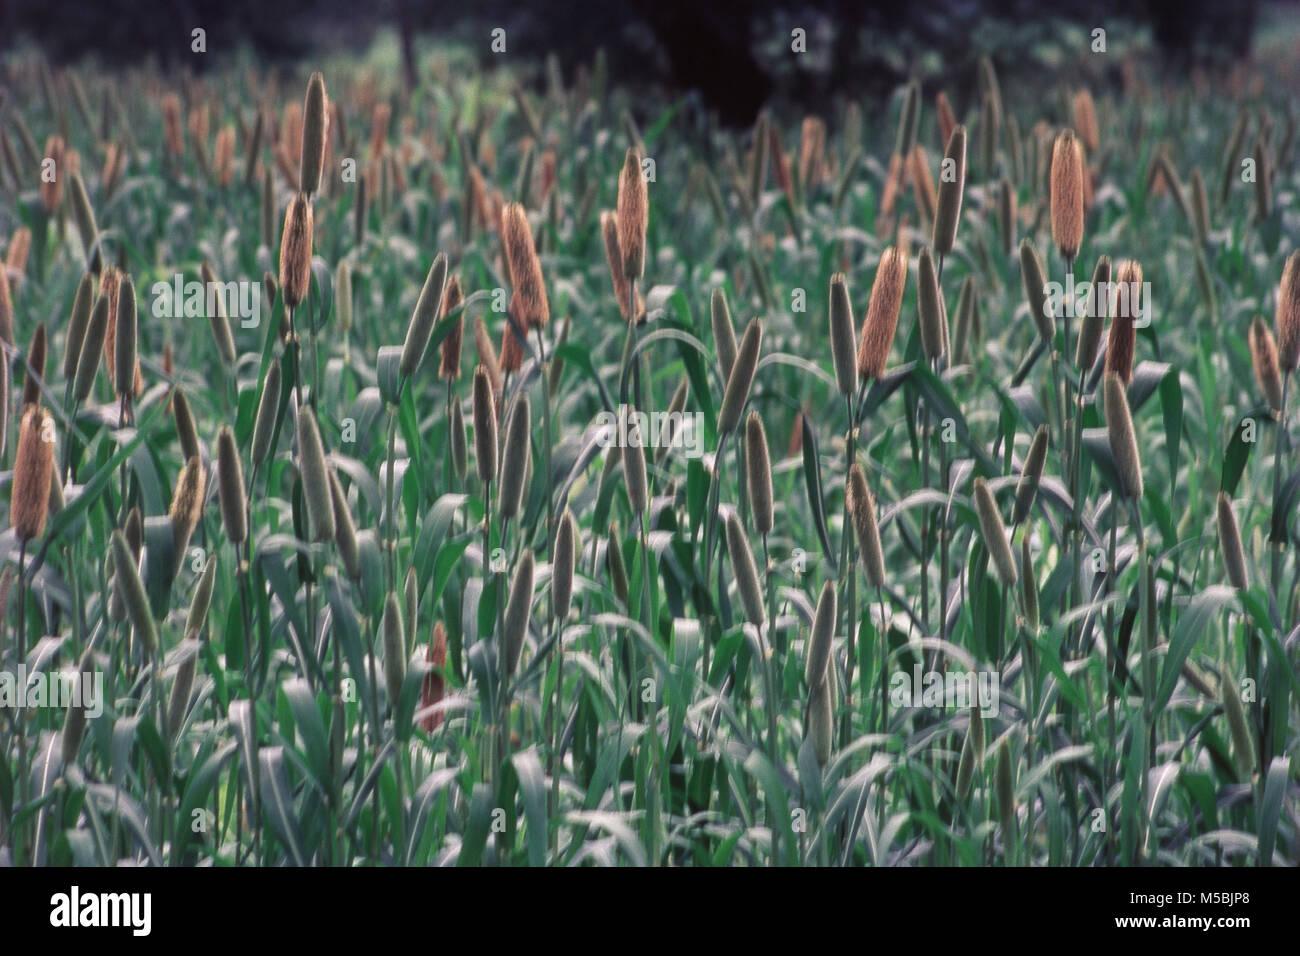 Close up of Bajra, cereal grain field, Sakori, Maharashtra, India - Stock Image